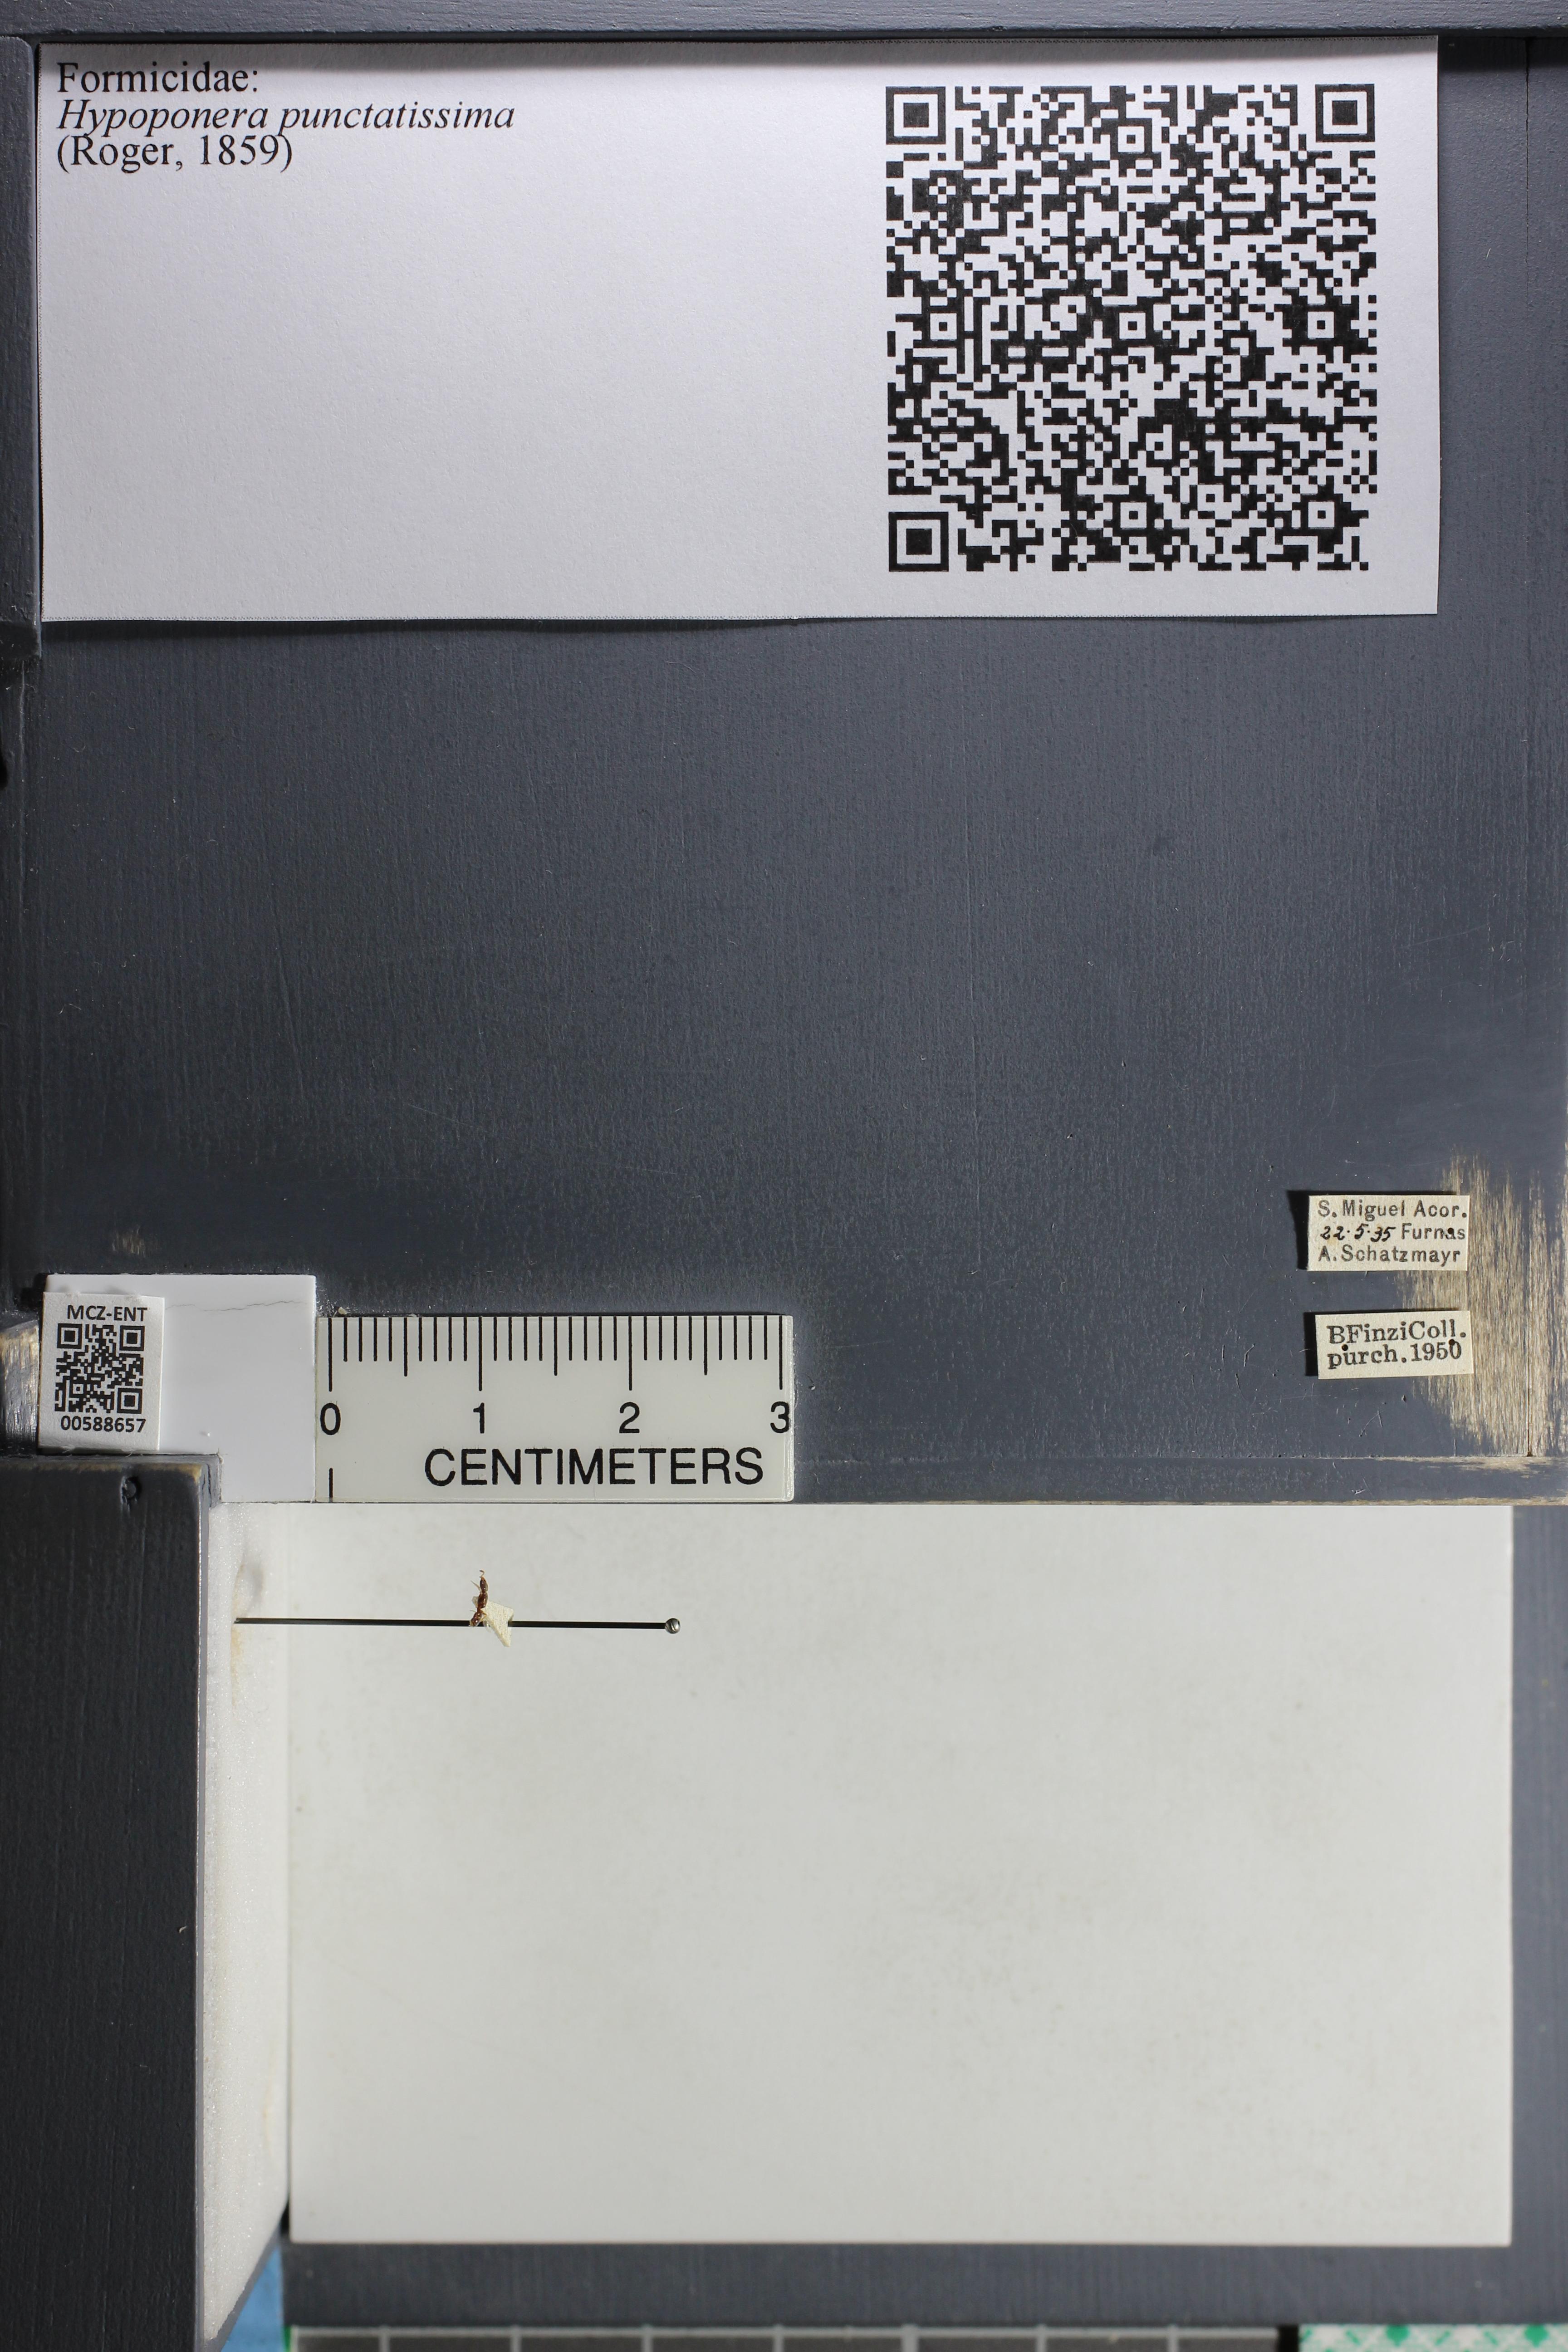 Media of type image, shows cataloged_item. MCZ:Ent:588657 Identified as Hypoponera punctatissima.